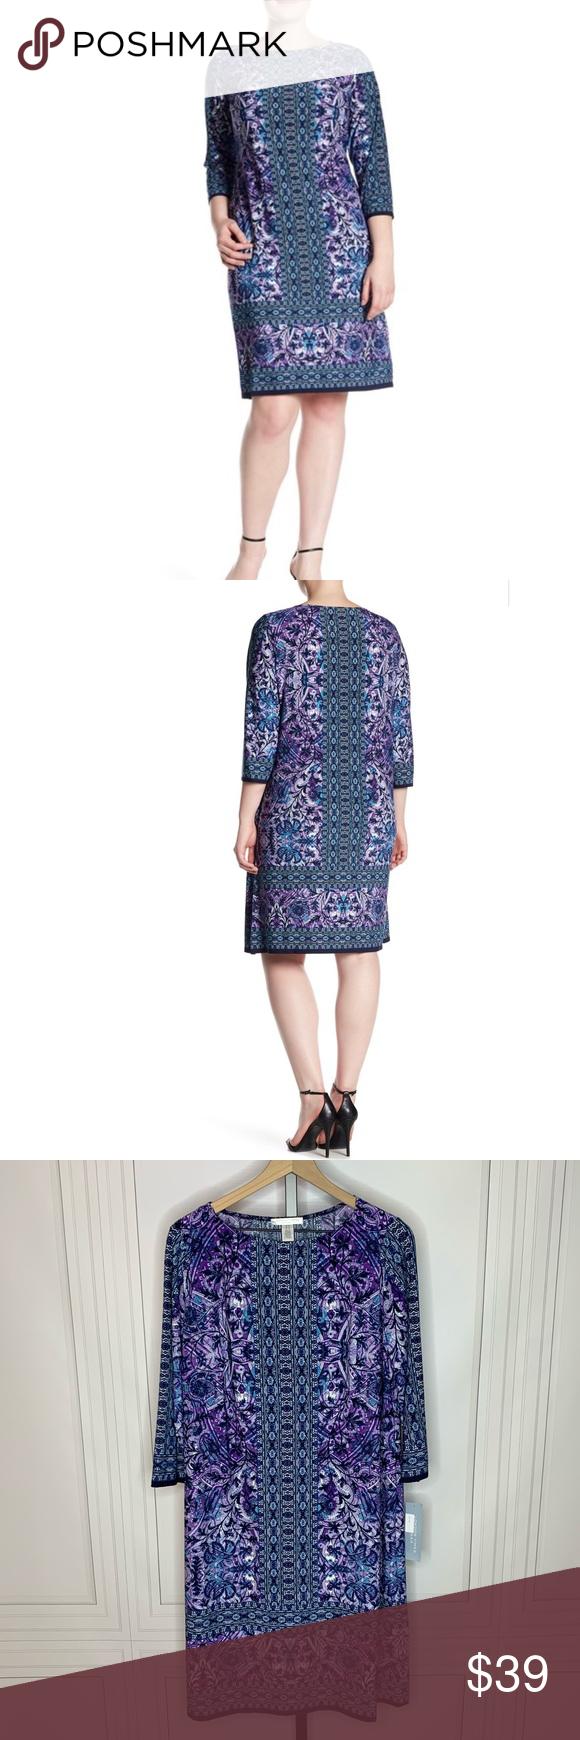 London Times 3 4 Sleeve Shift Dress Beautiful Spring Dresses Clothes Design Shift Dress [ 1740 x 580 Pixel ]